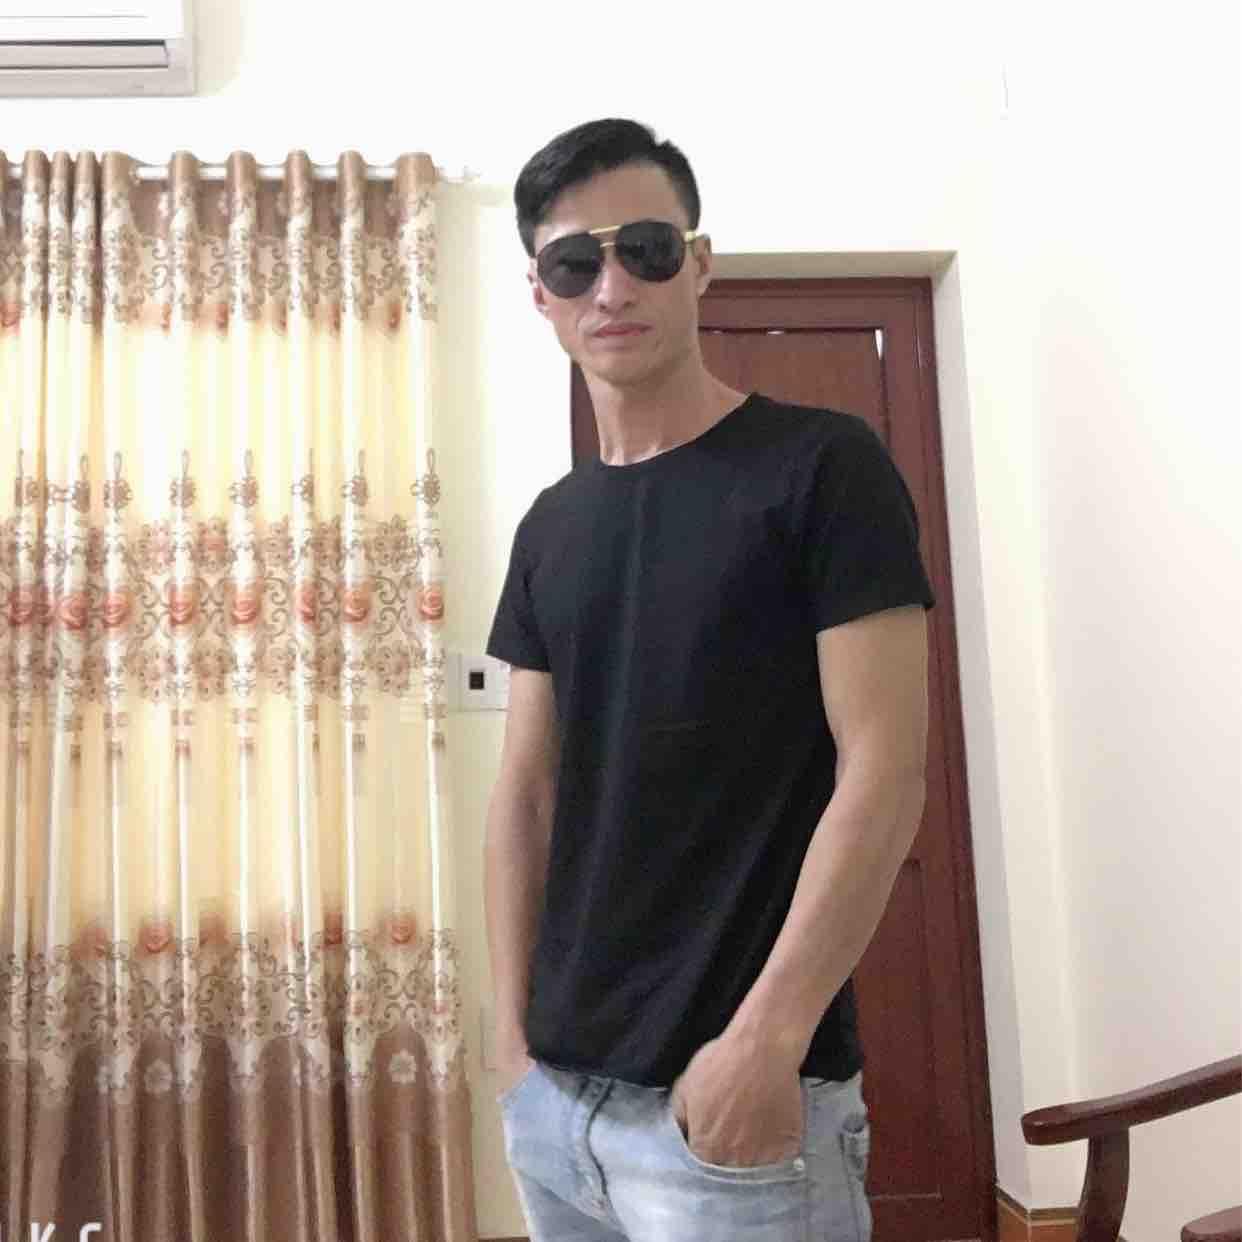 Duong Minh Nguyễn